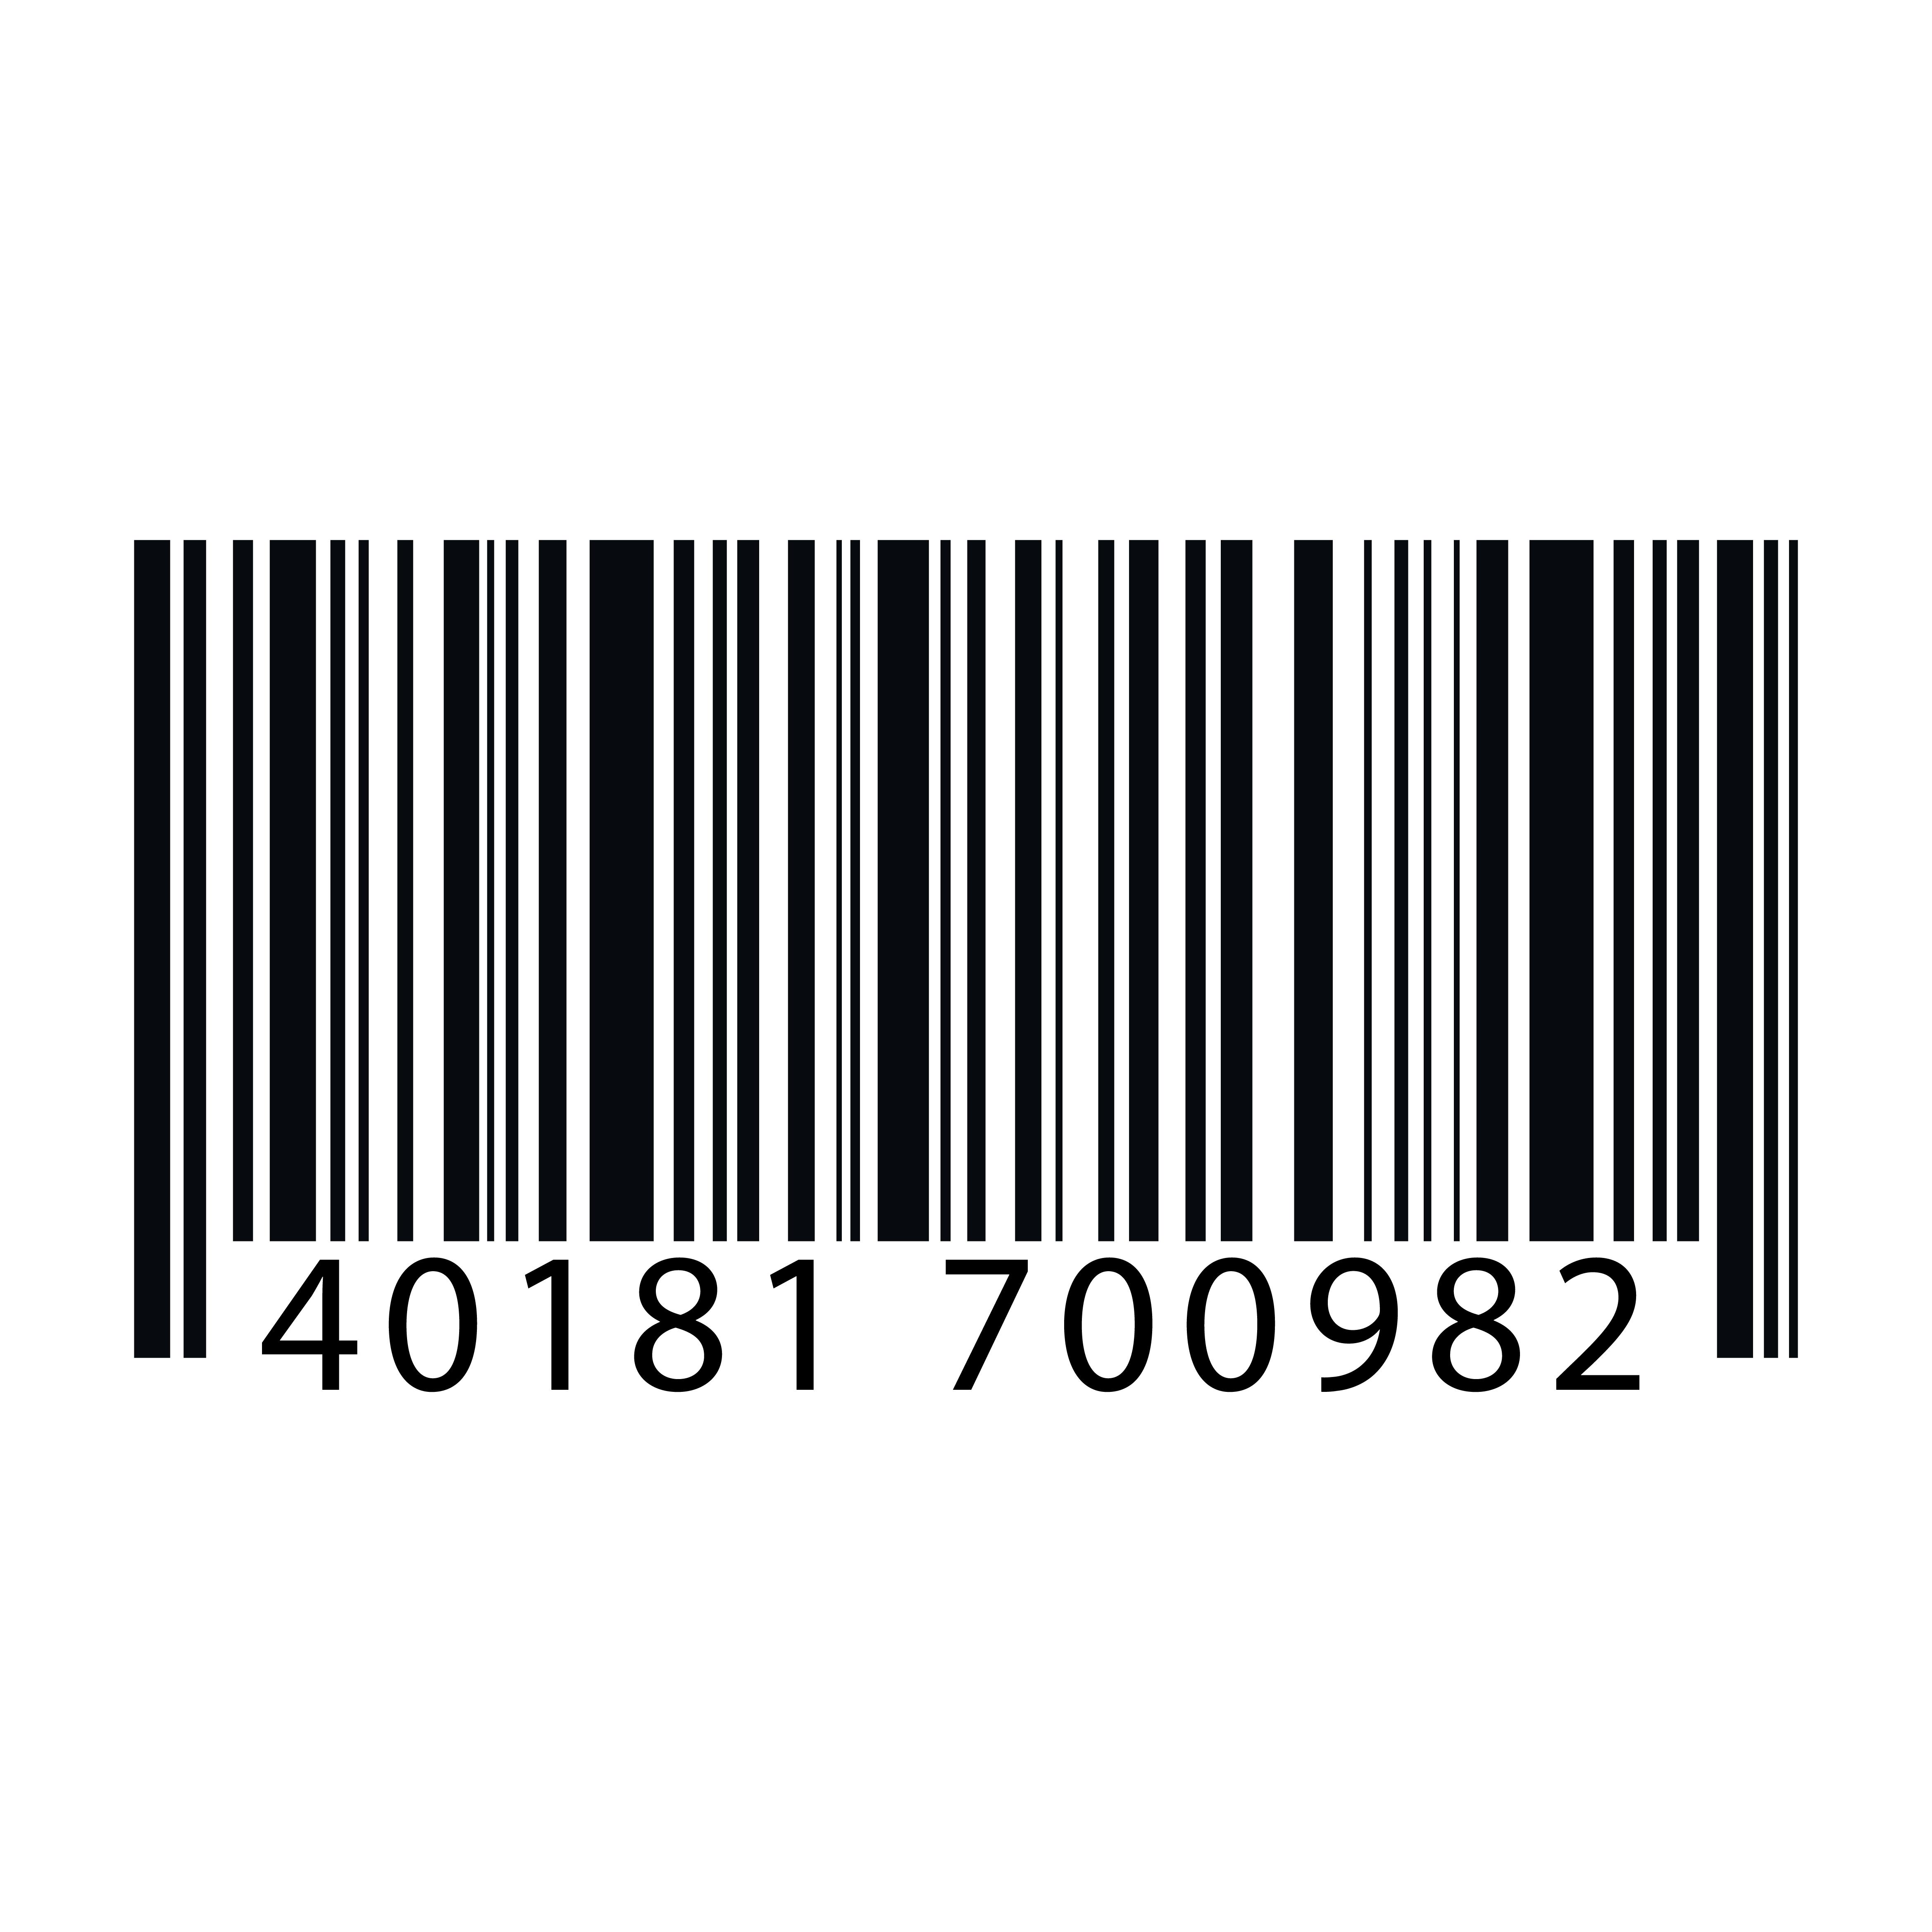 barcode vector illustration - Download Free Vectors